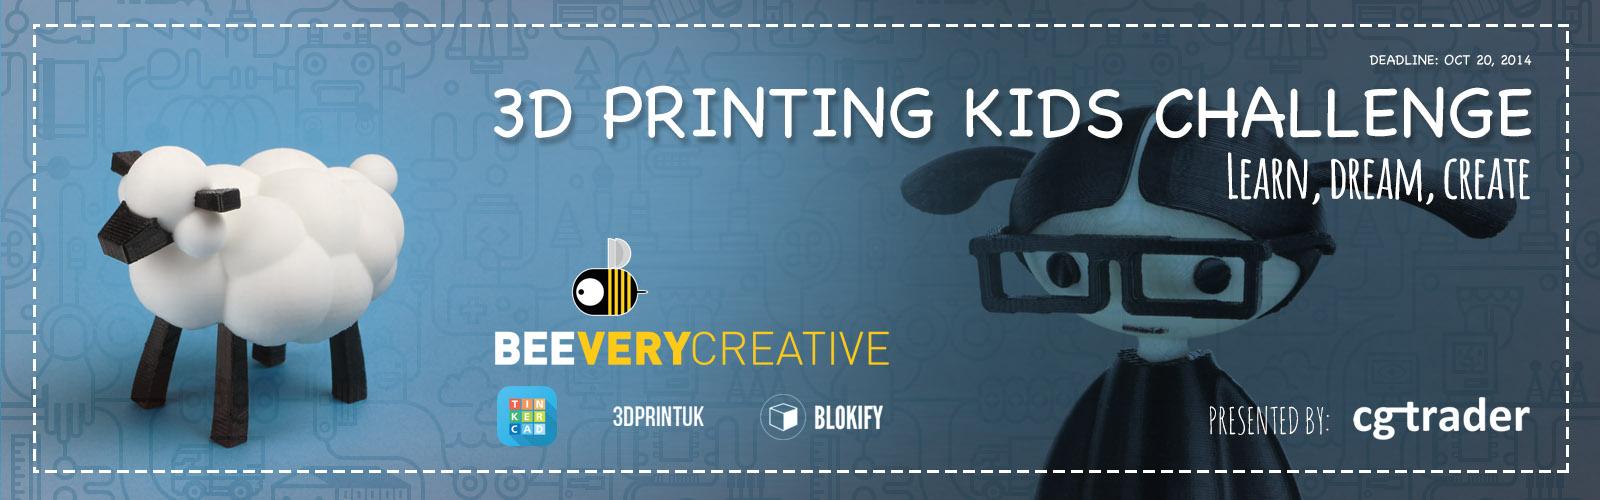 3D Printing Kids Challenge